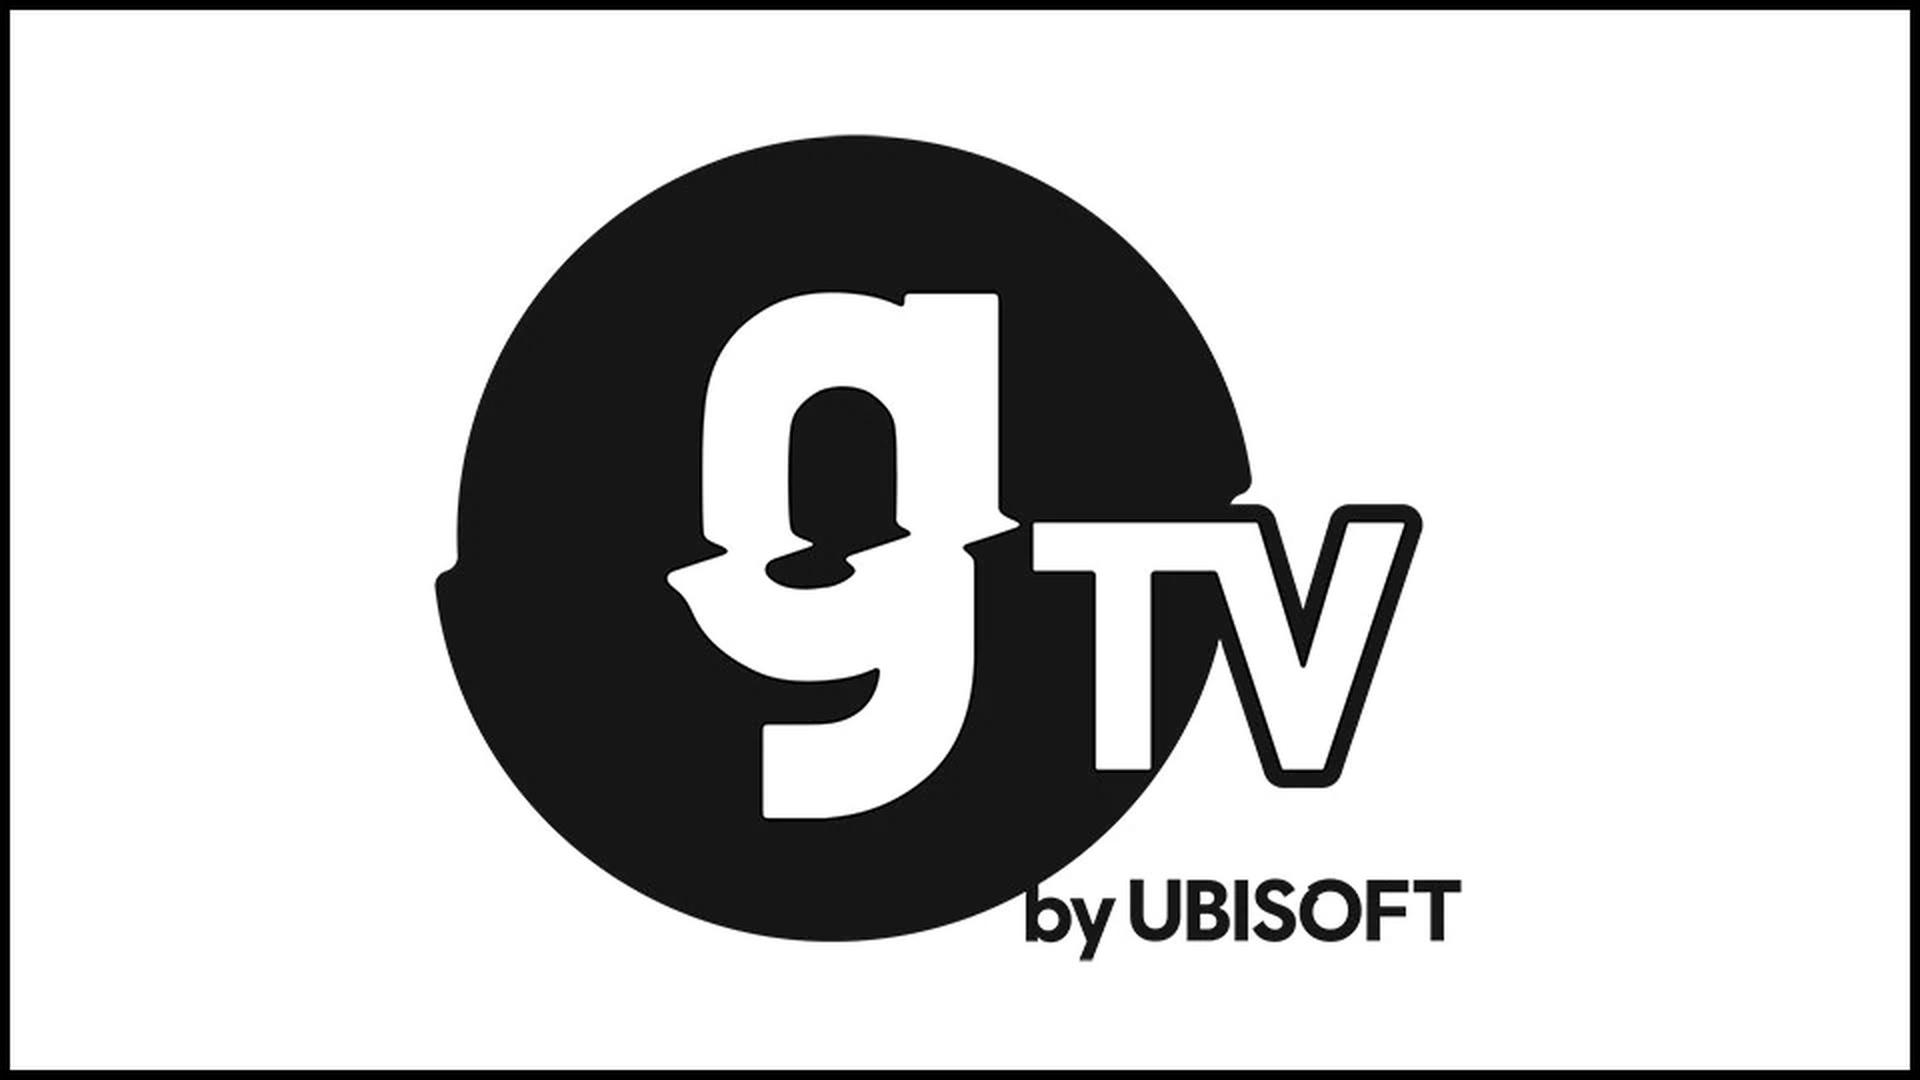 Ubisoft gTV